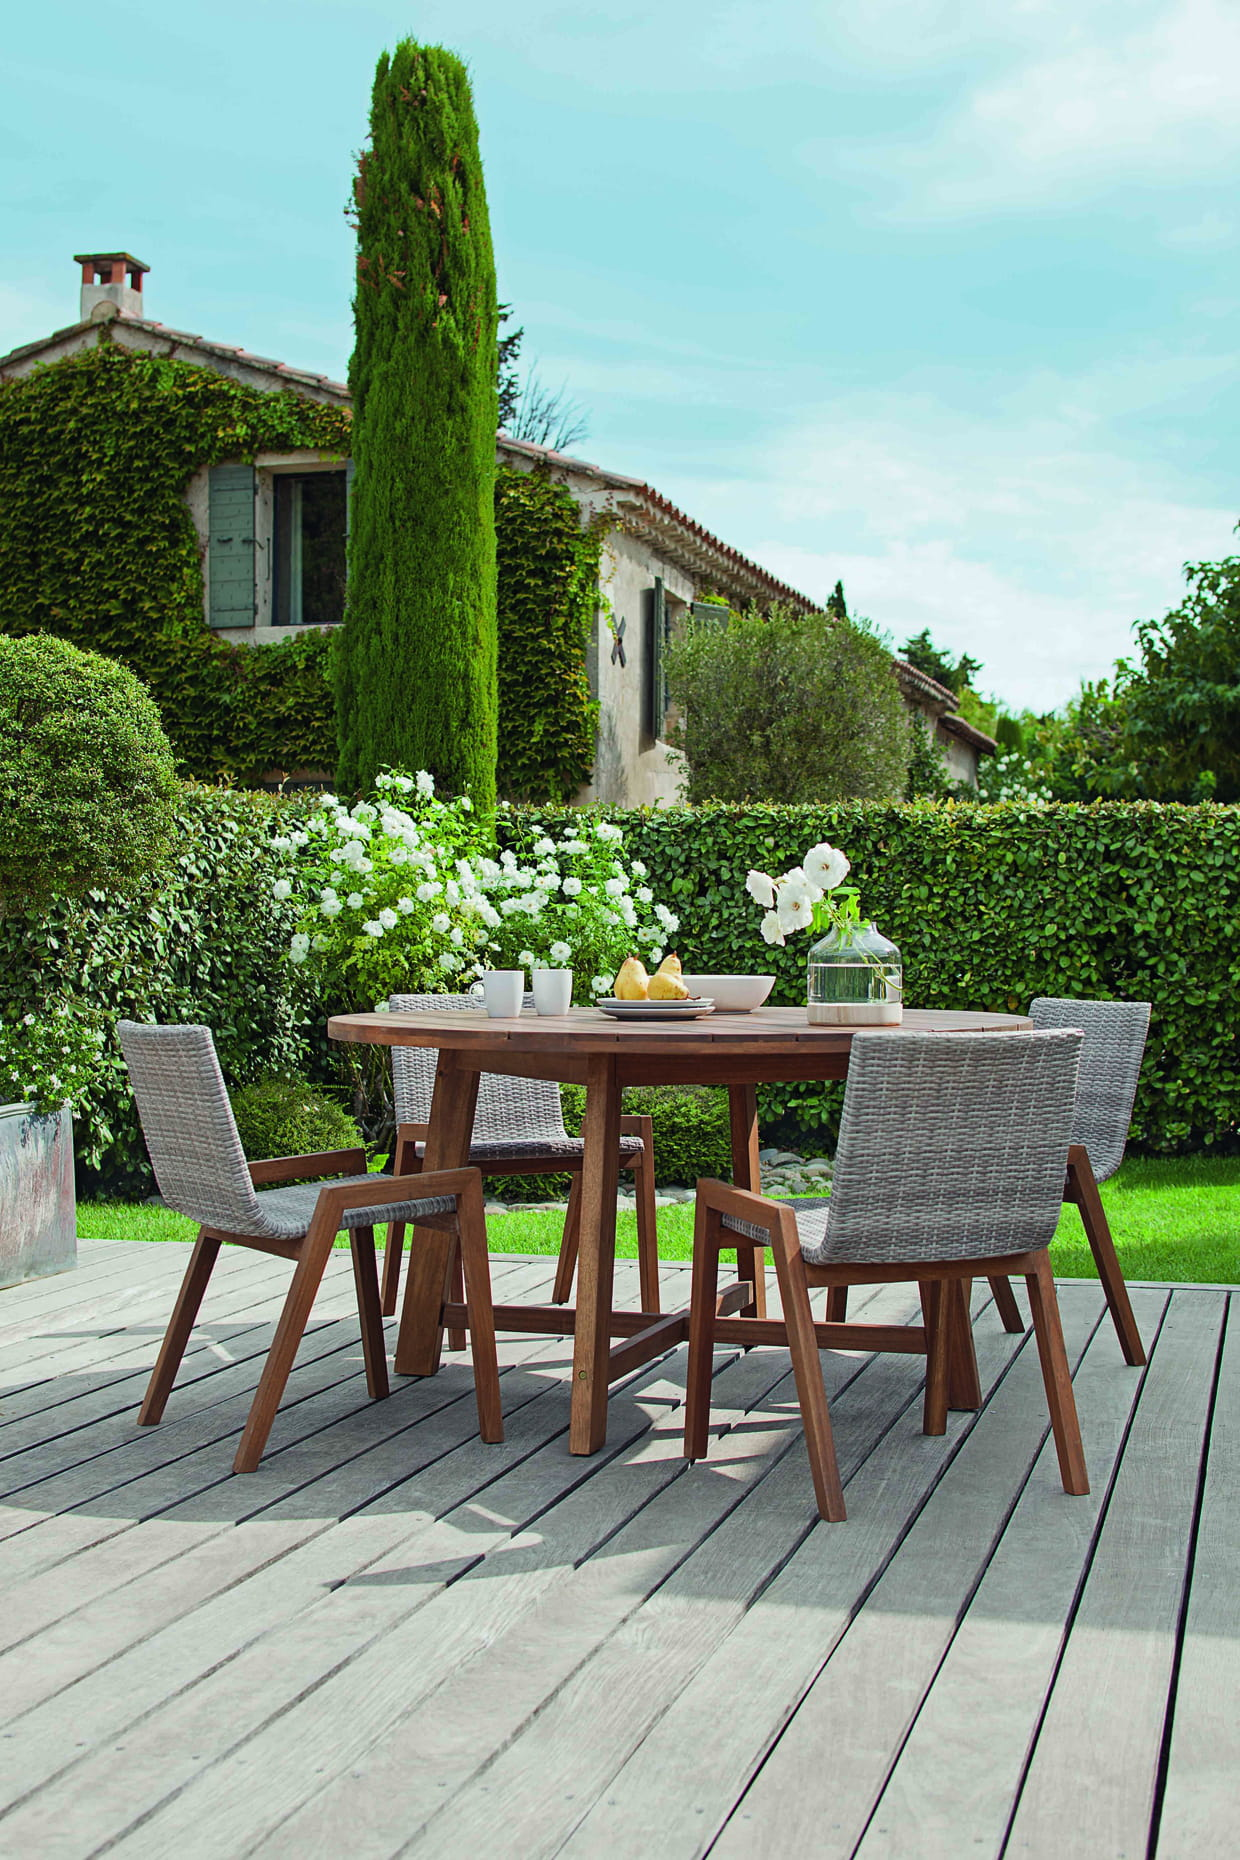 Salon de jardin azal e chez jardiland for Decoration jardin jardiland